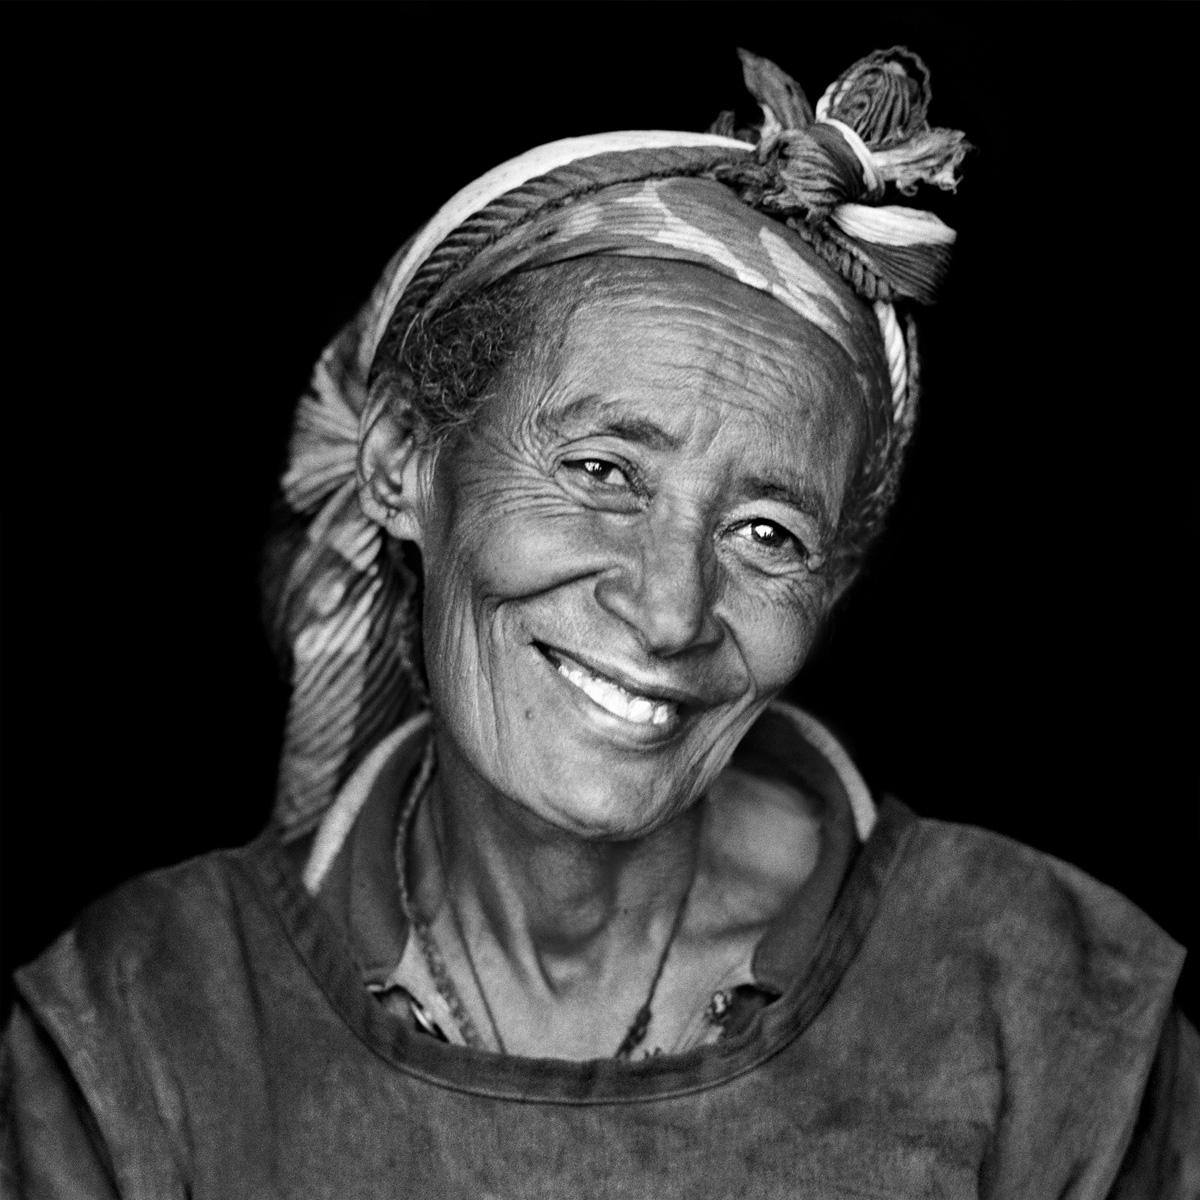 © Christine Turnauer - Worlid, Ethiopia, 2011